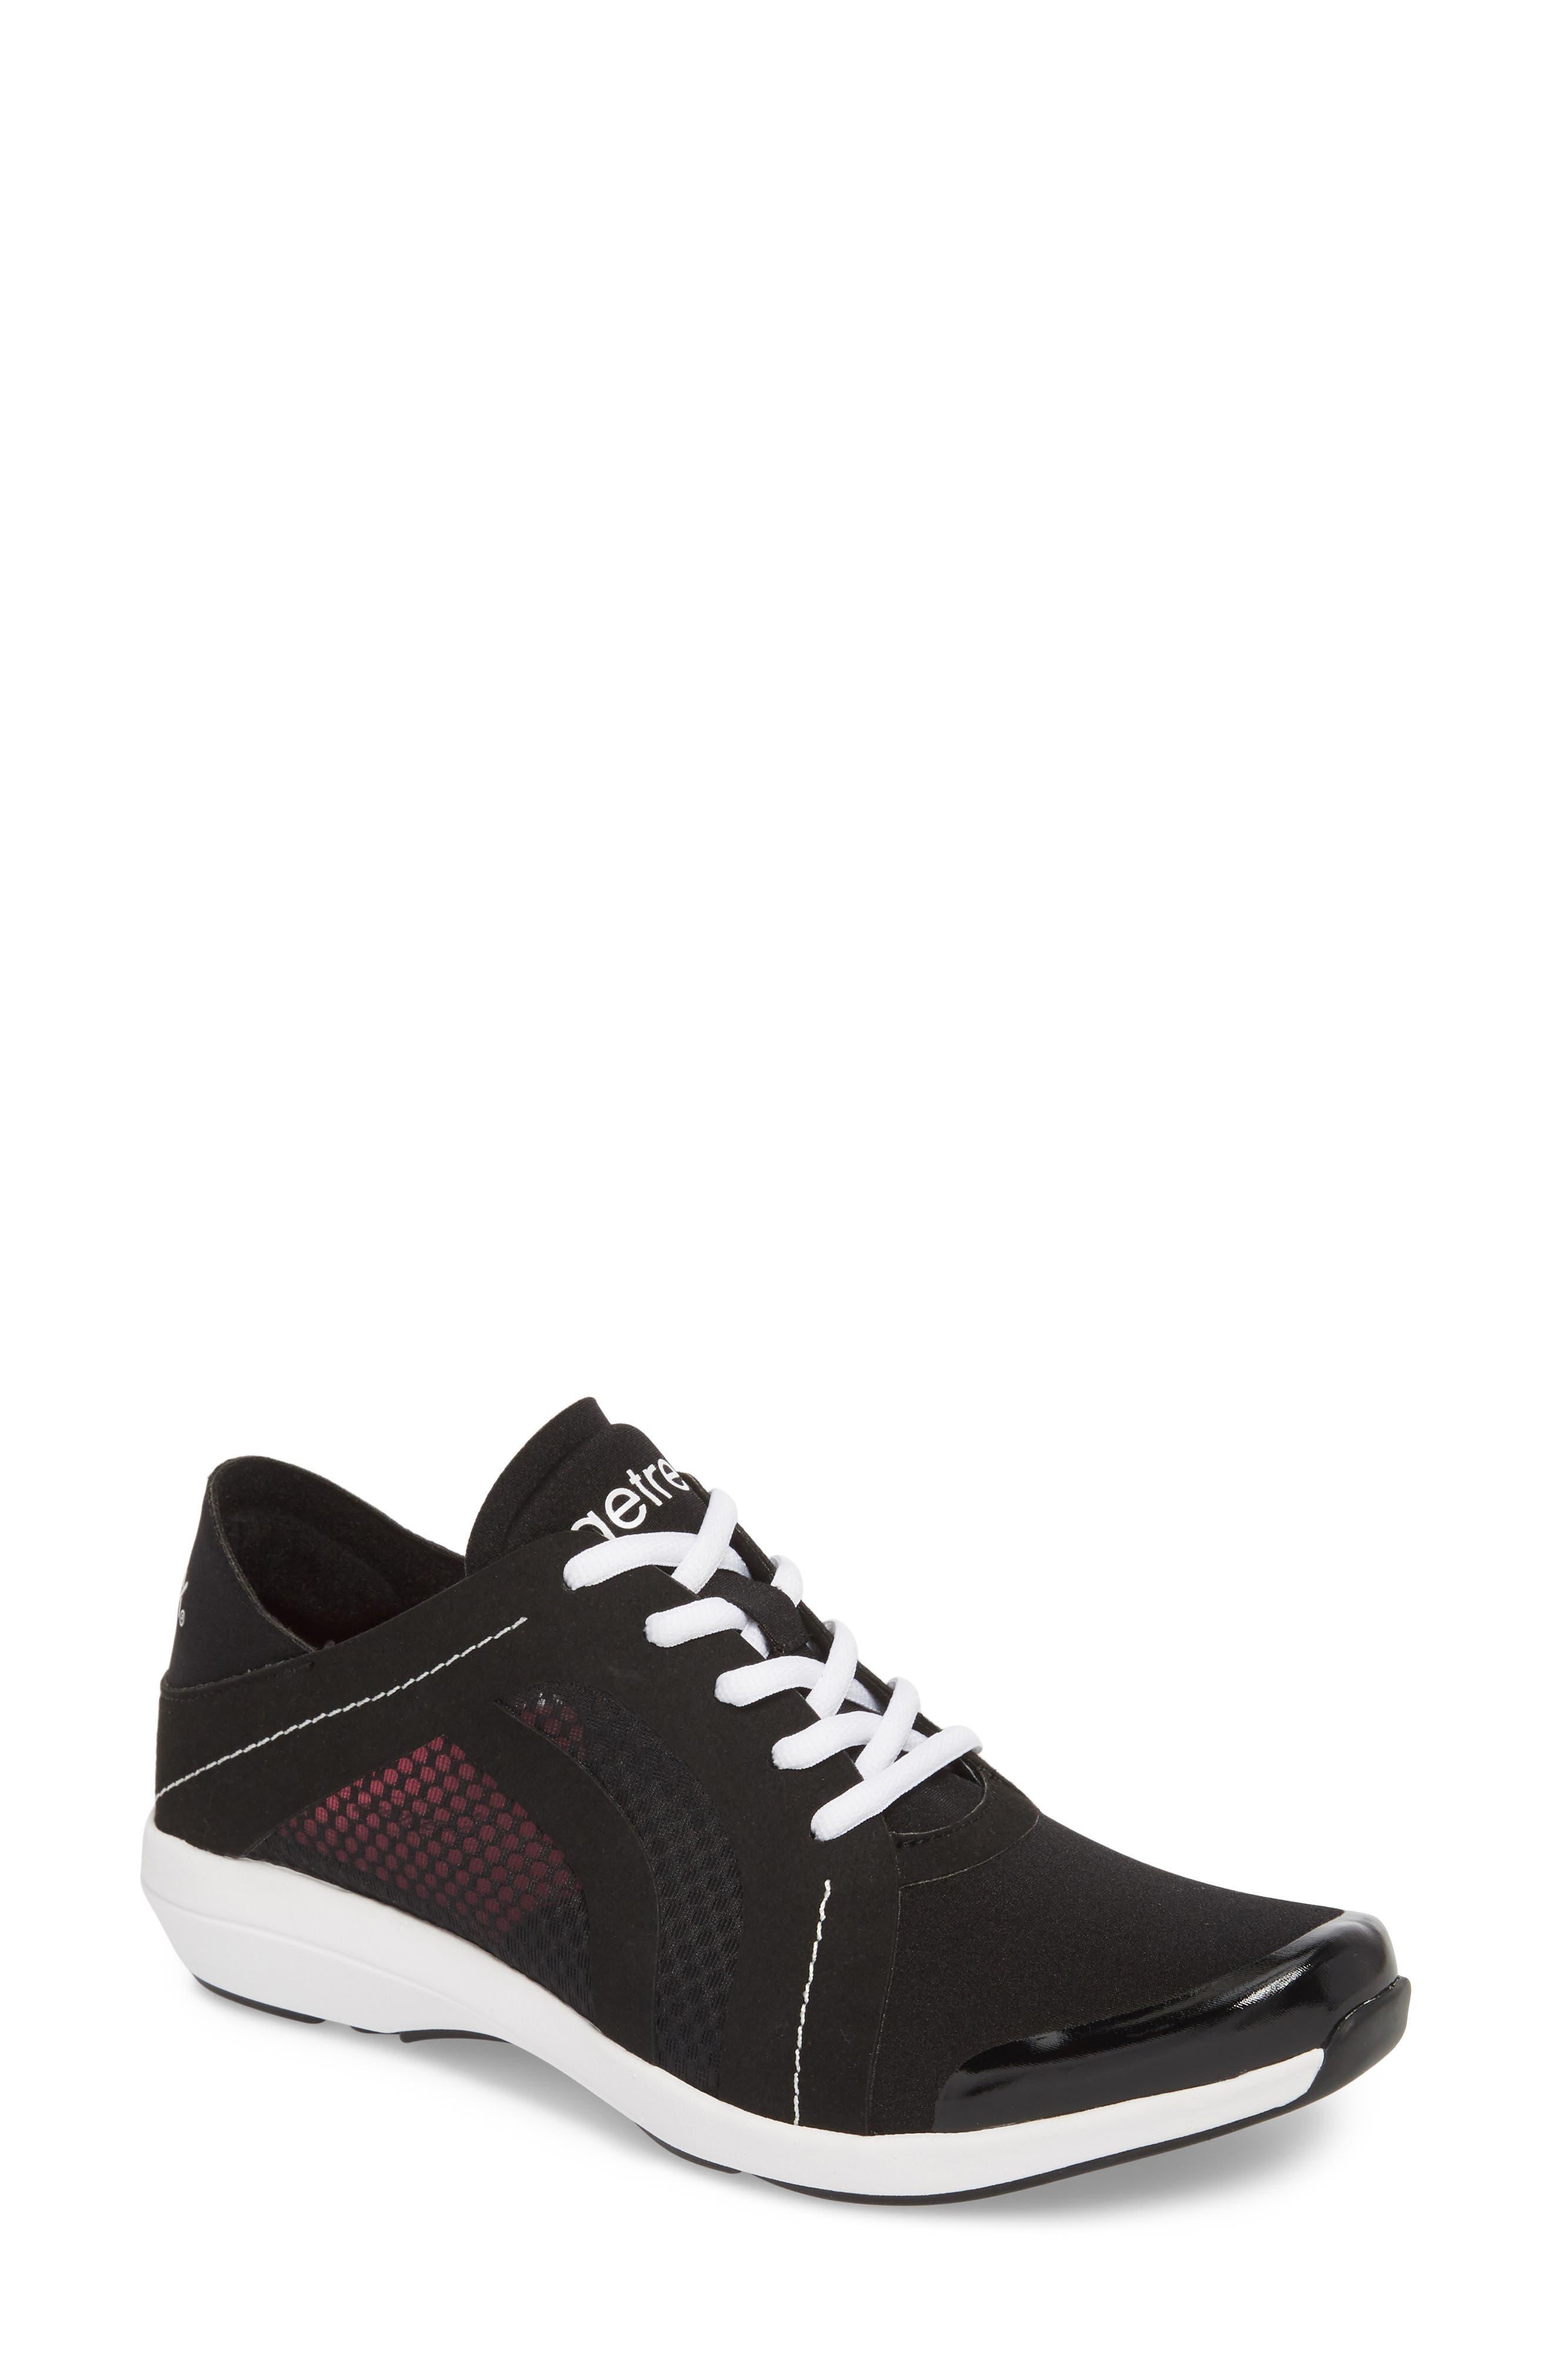 Sloane Sneaker,                             Main thumbnail 1, color,                             BLACK FABRIC